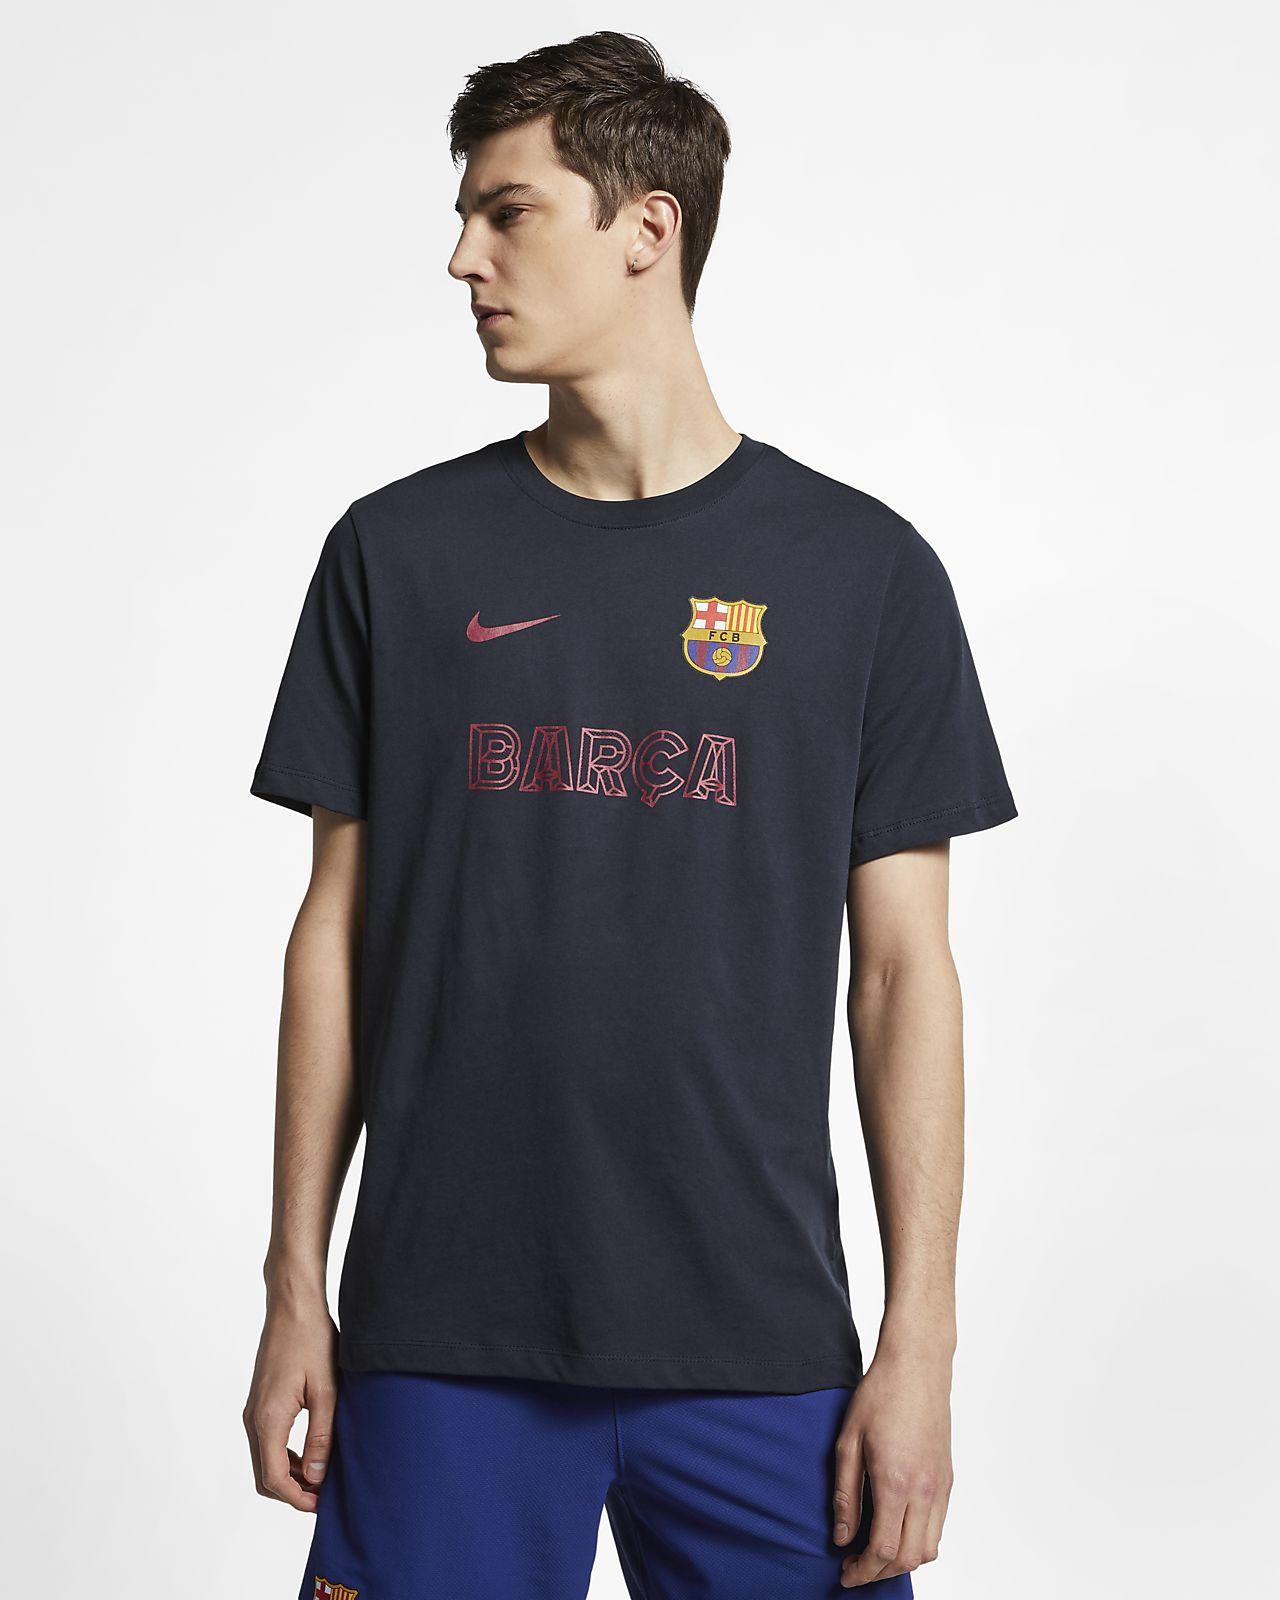 T-shirt Barcelona F.C Homme